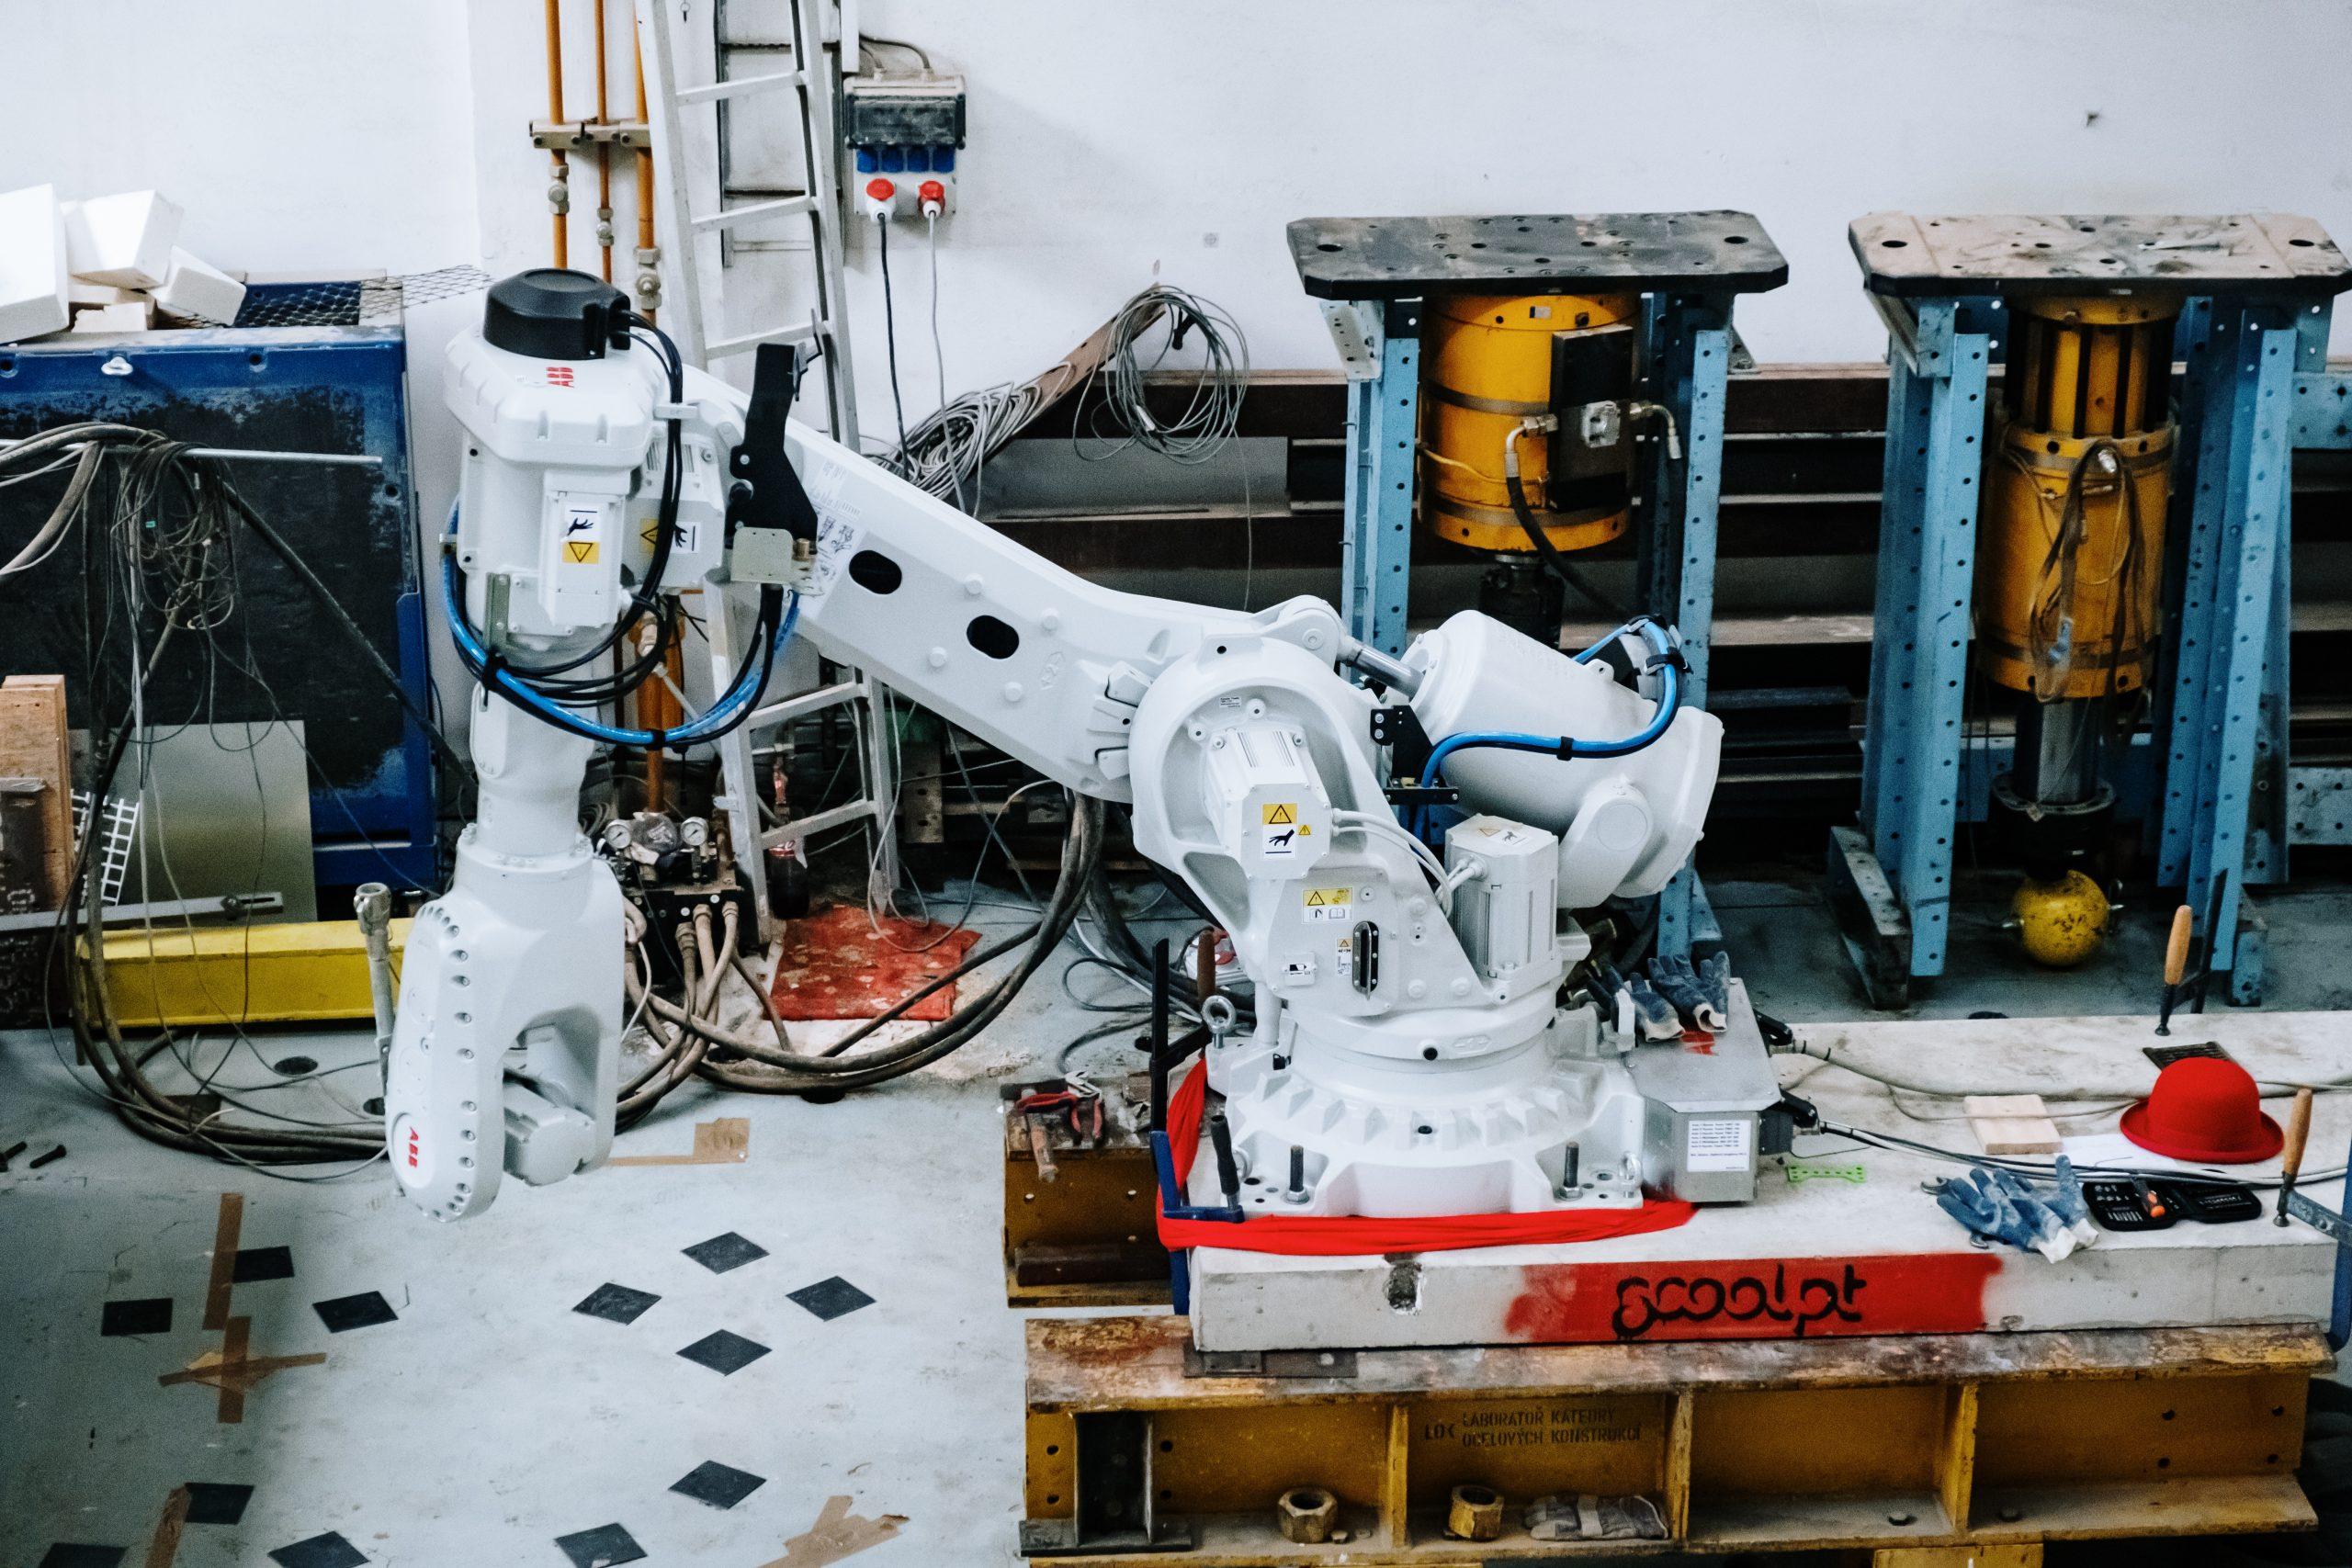 burinka-robotic-arm.jpg